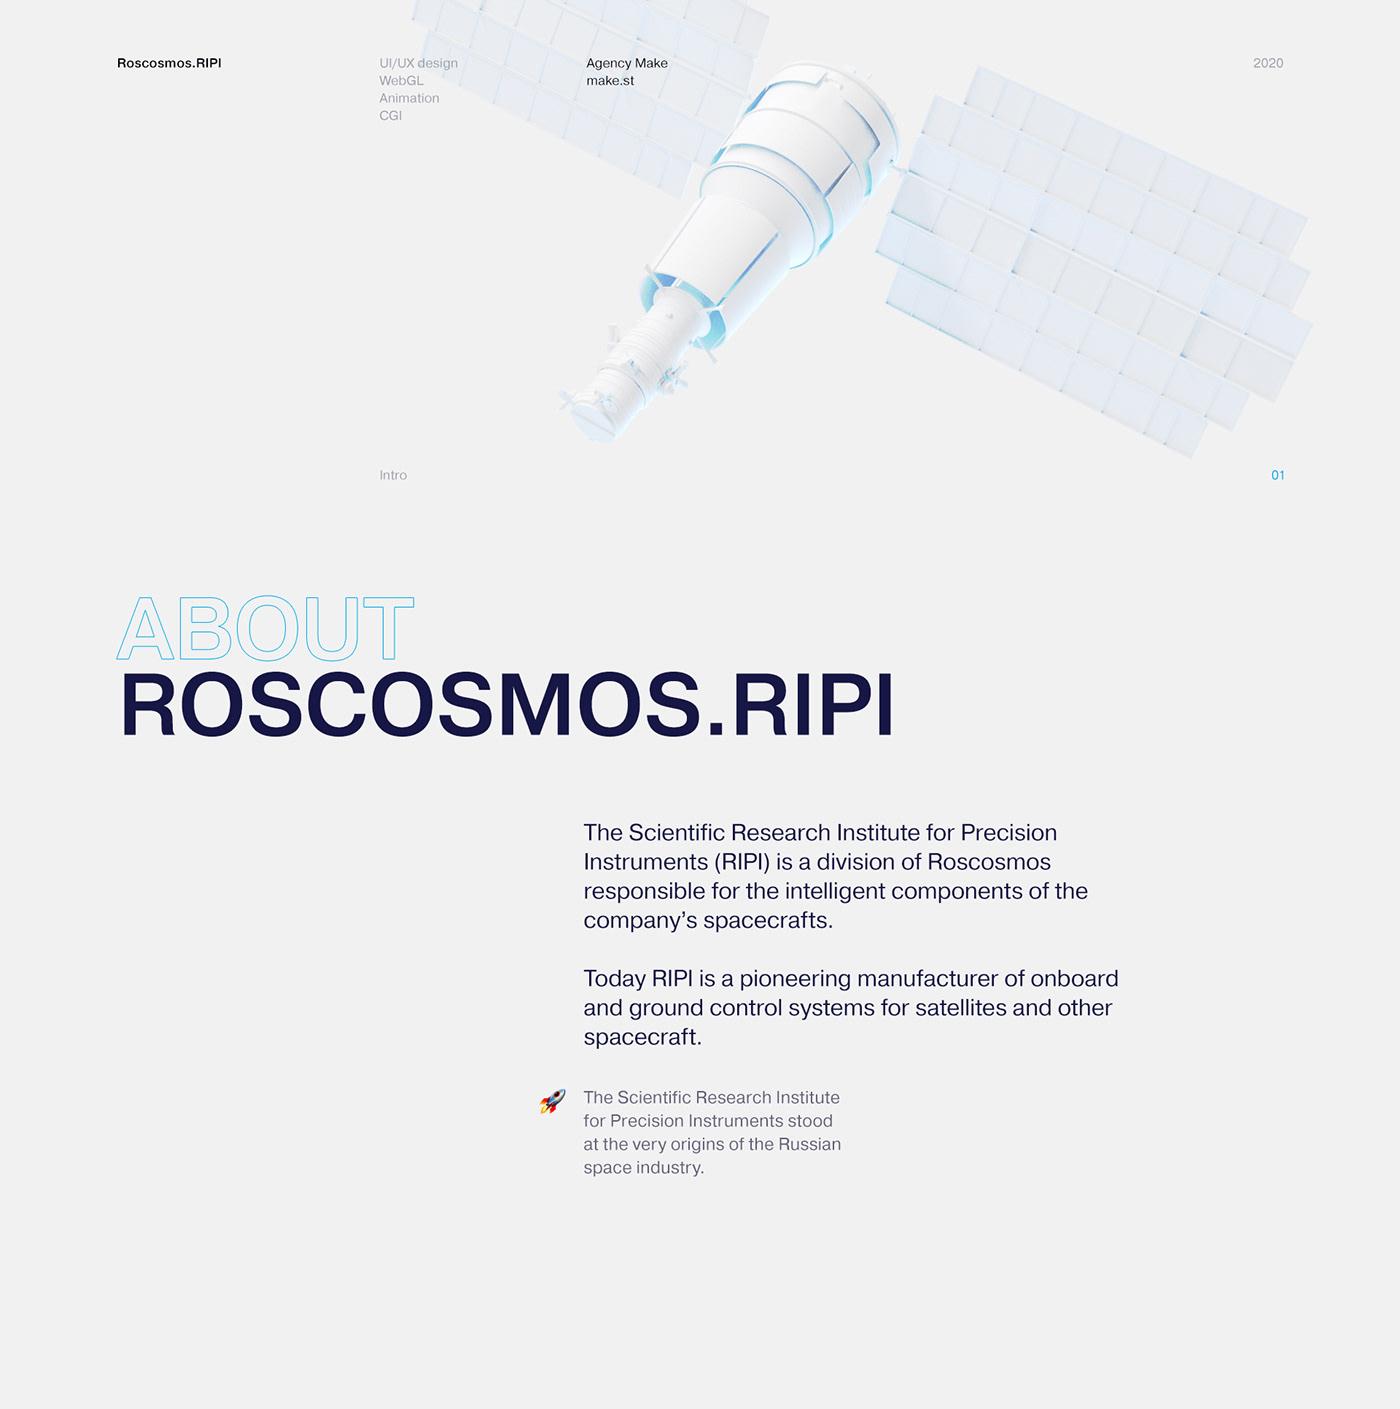 roscosmos Space  webgl РОСКОСМОС promo Web UI UI/UX Webdesign three.js